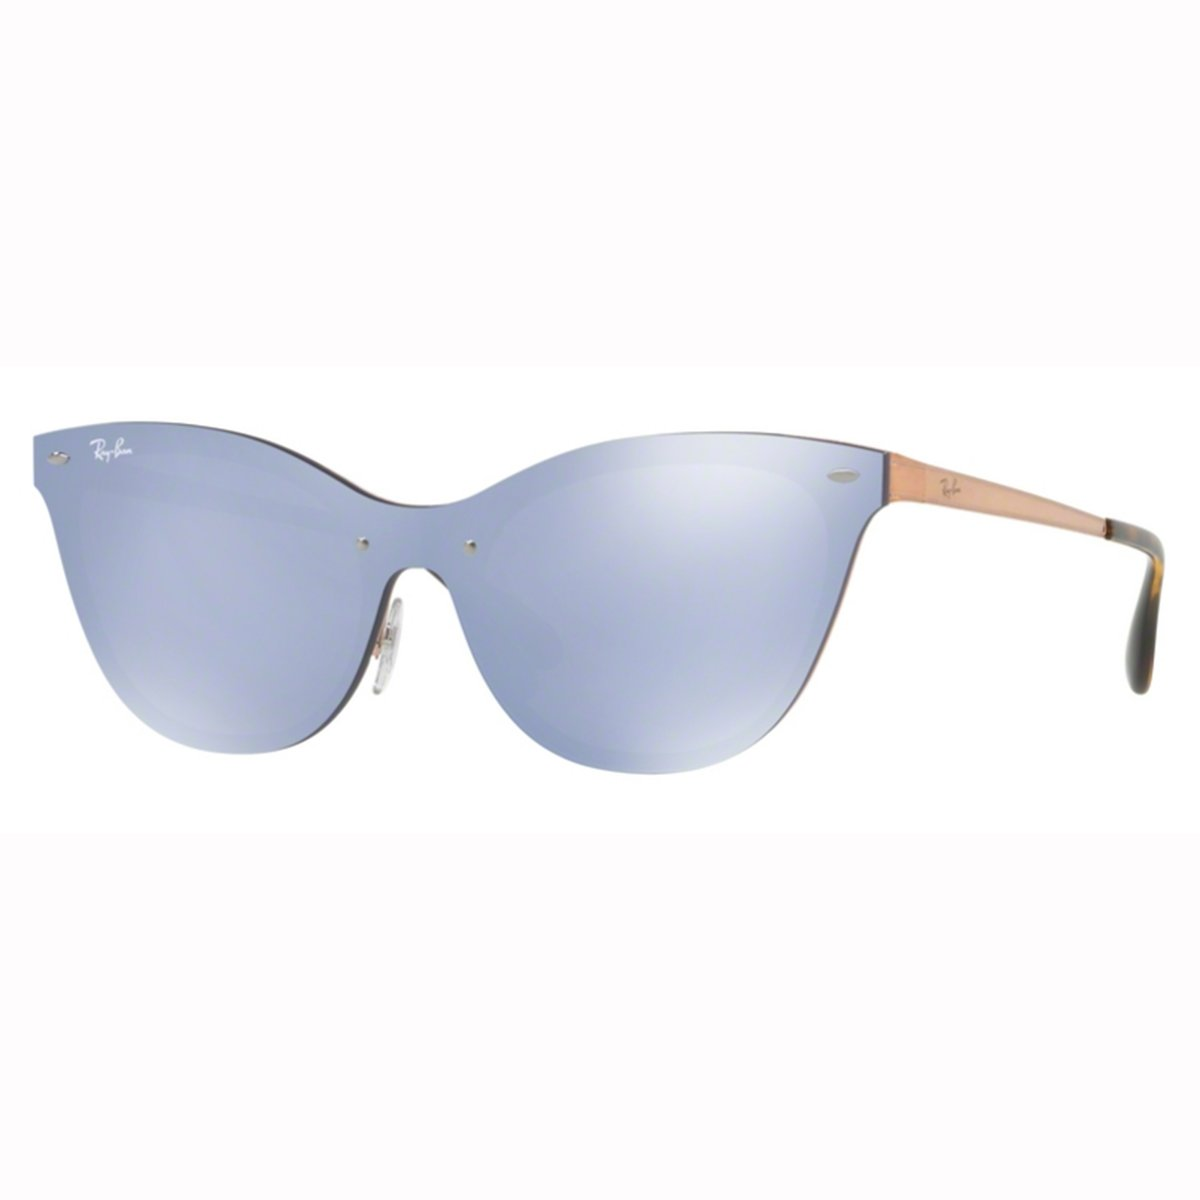 29e08eb0124dc Compre Óculos de Sol Ray Ban Blaze Cat Eye em 10X